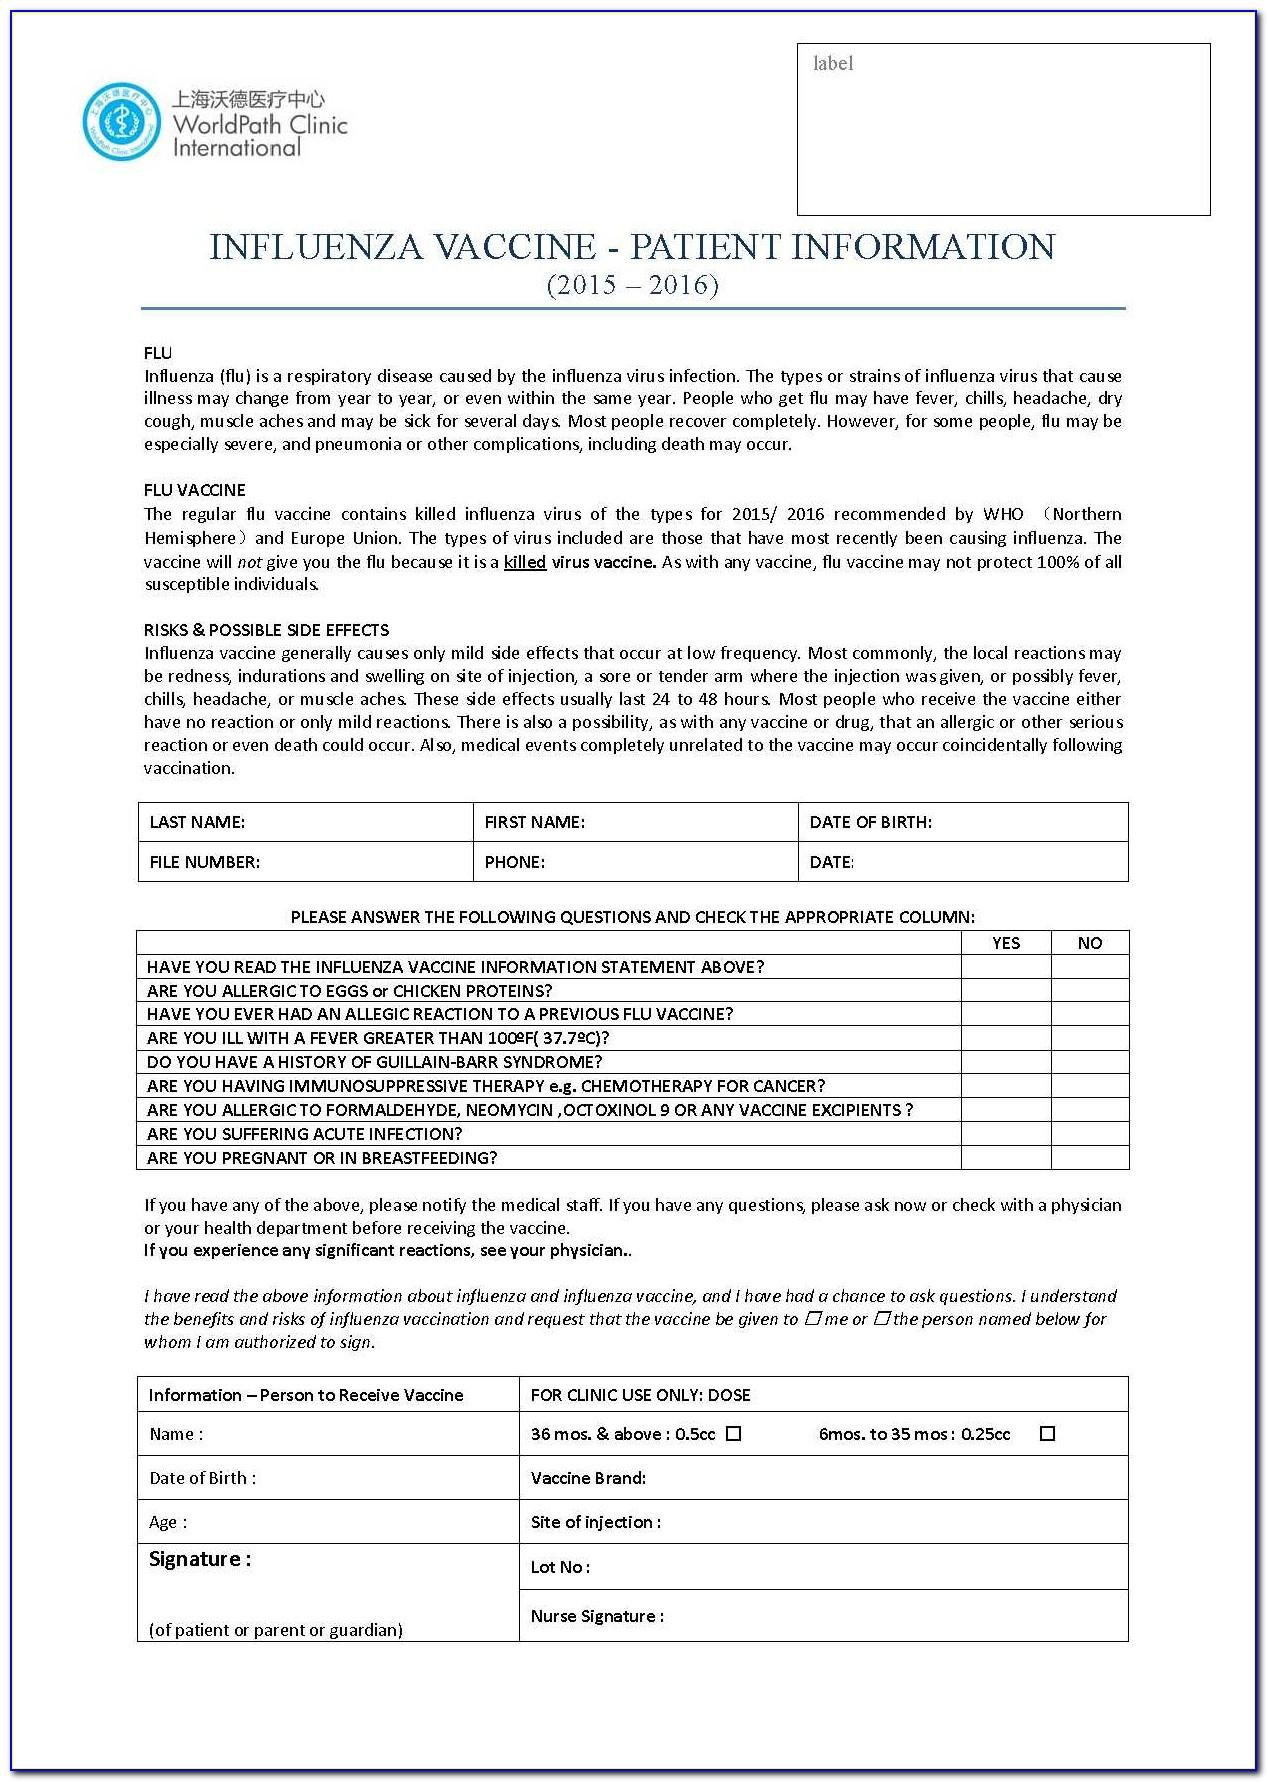 Influenza Vaccine Consent Form 2018 Ontario